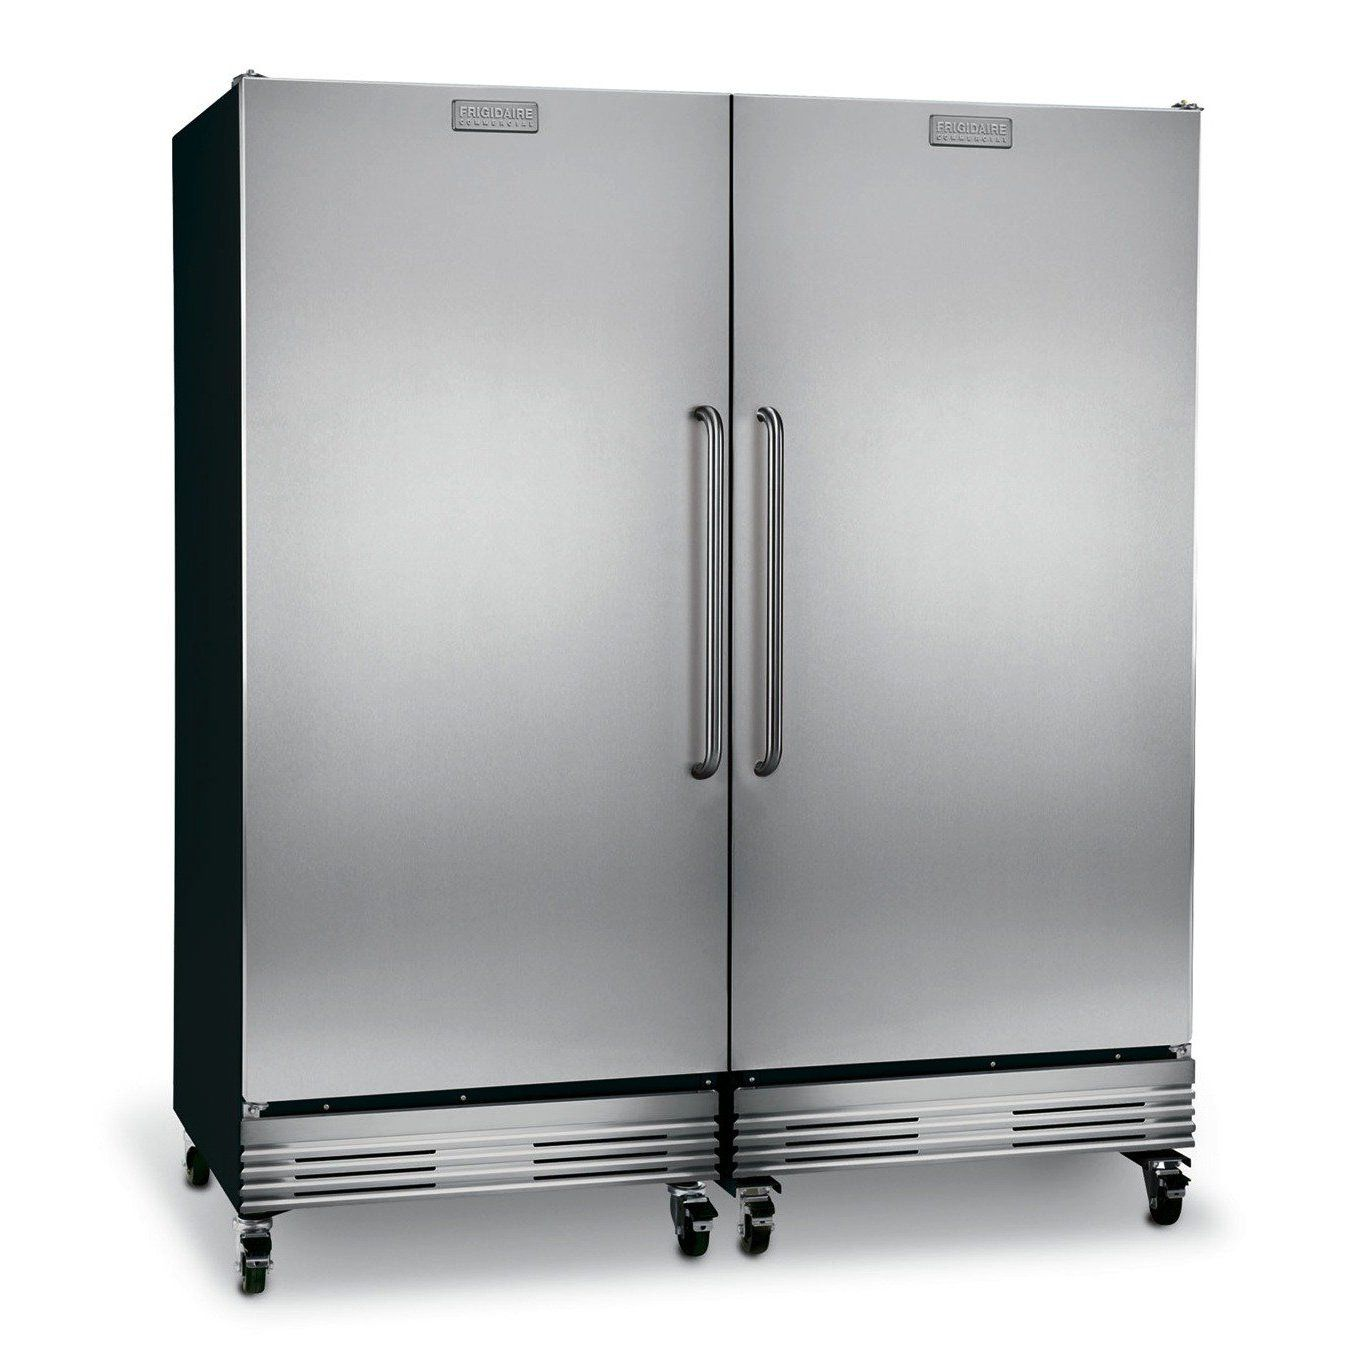 My Dream Fridge Freezer For My Family Frigidaire 39 Cu Ft